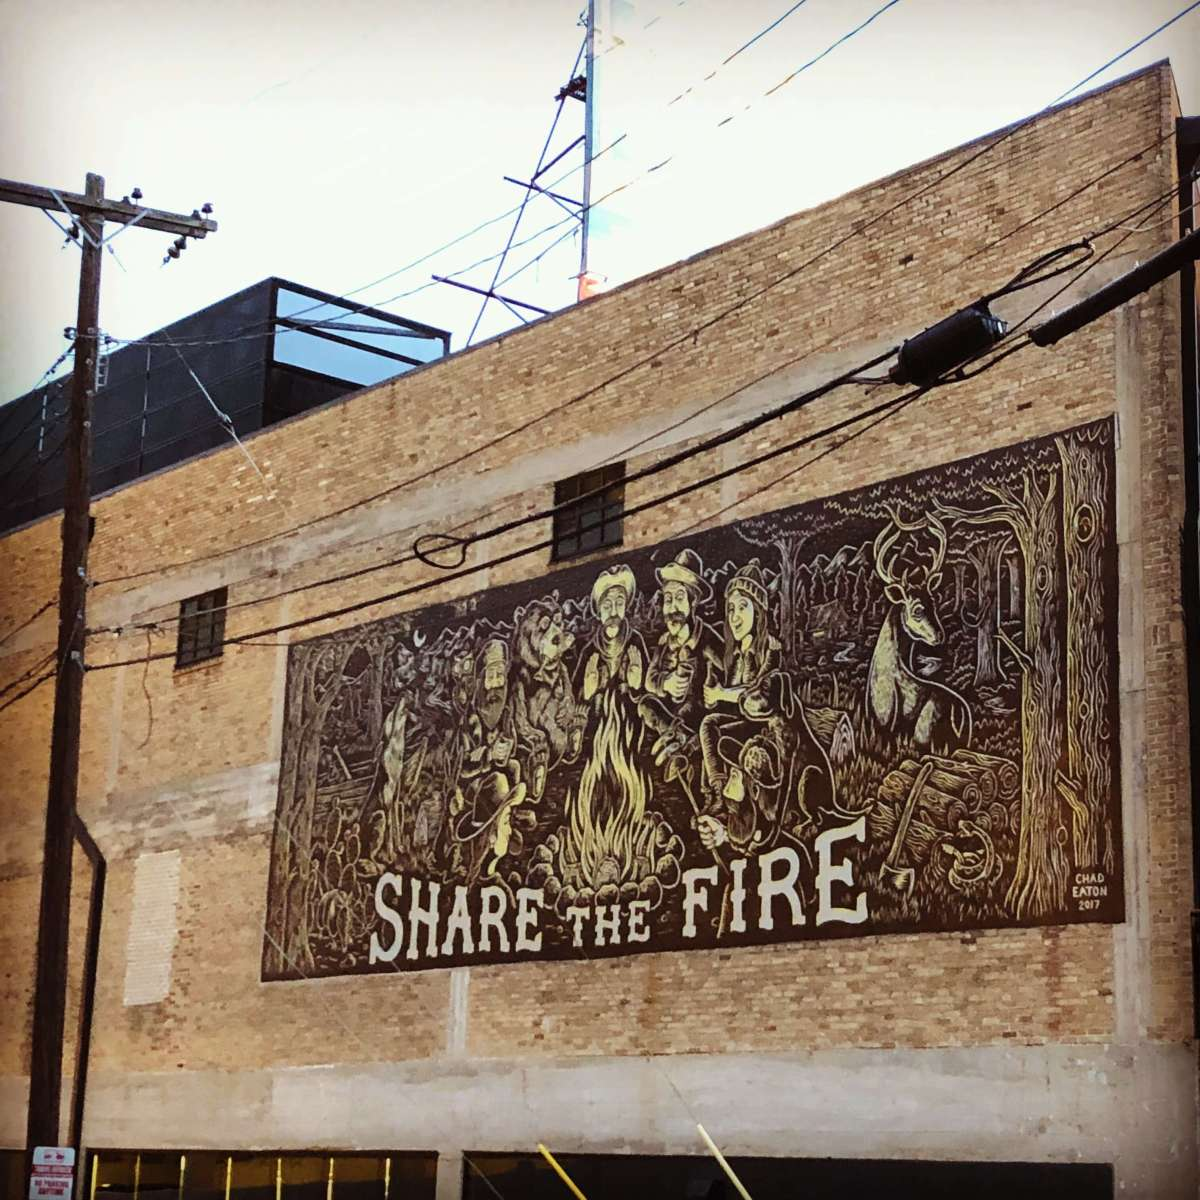 Street mural in Austin, Texas